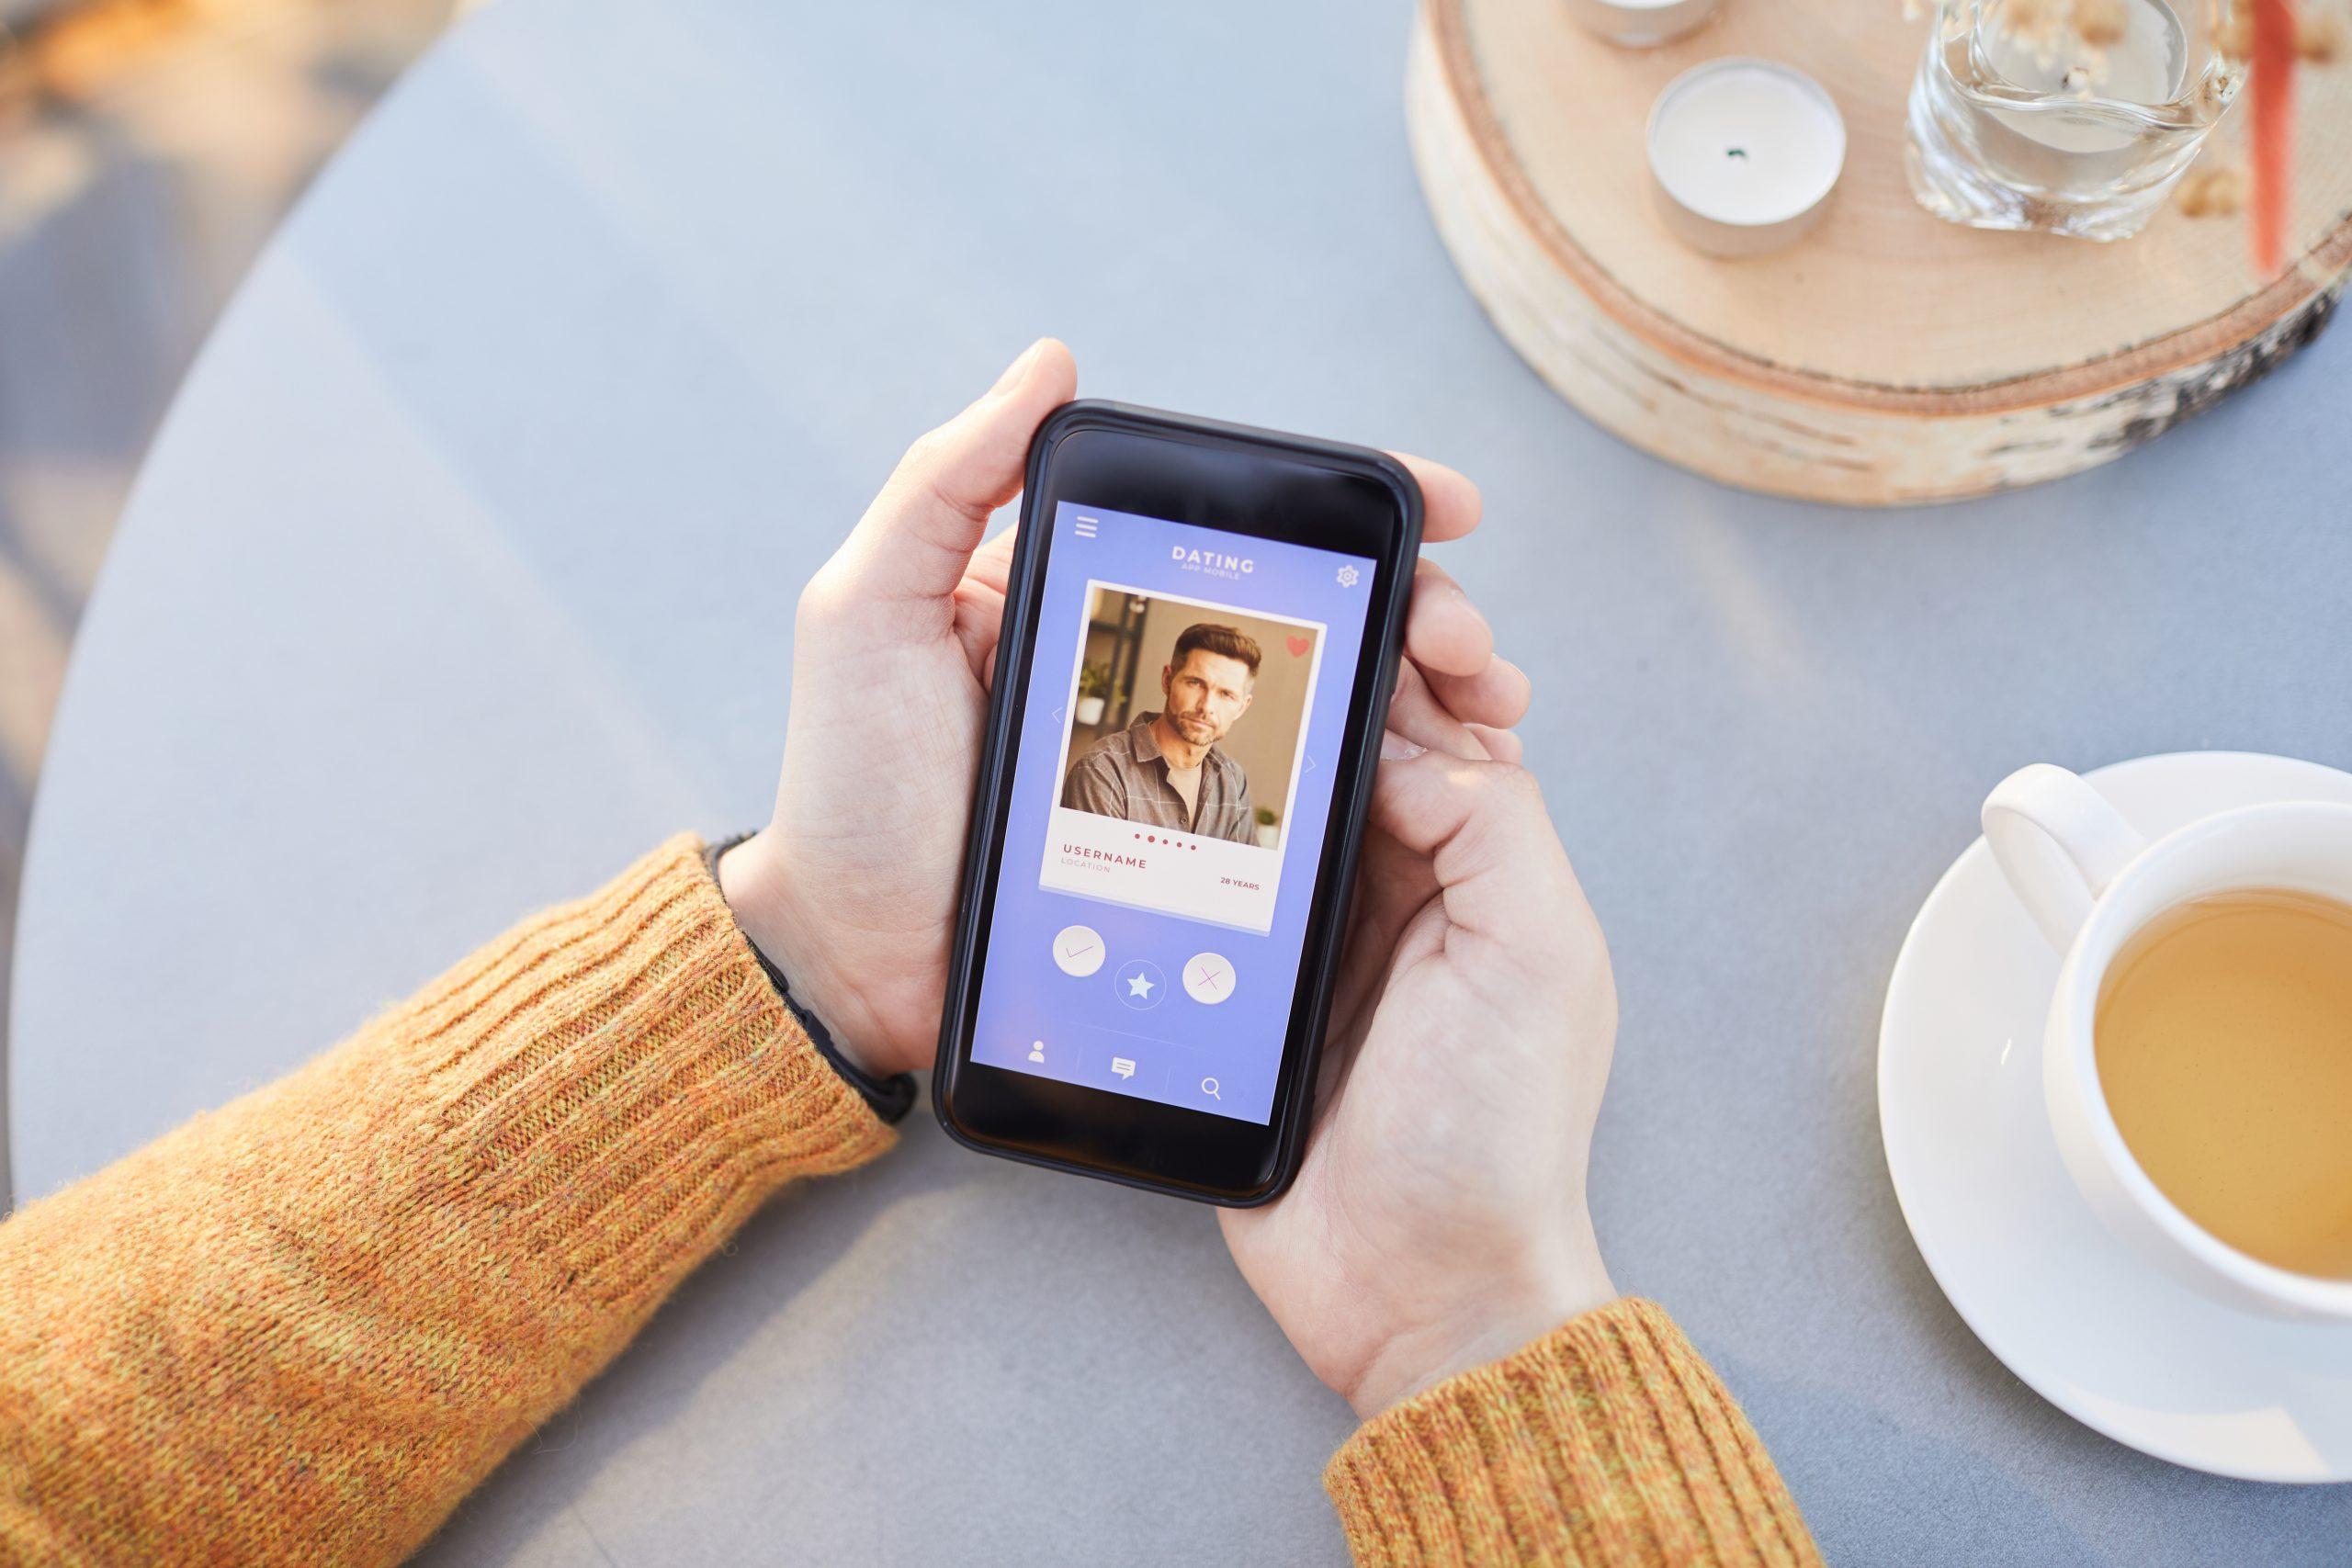 girls hand swiping an online dating app